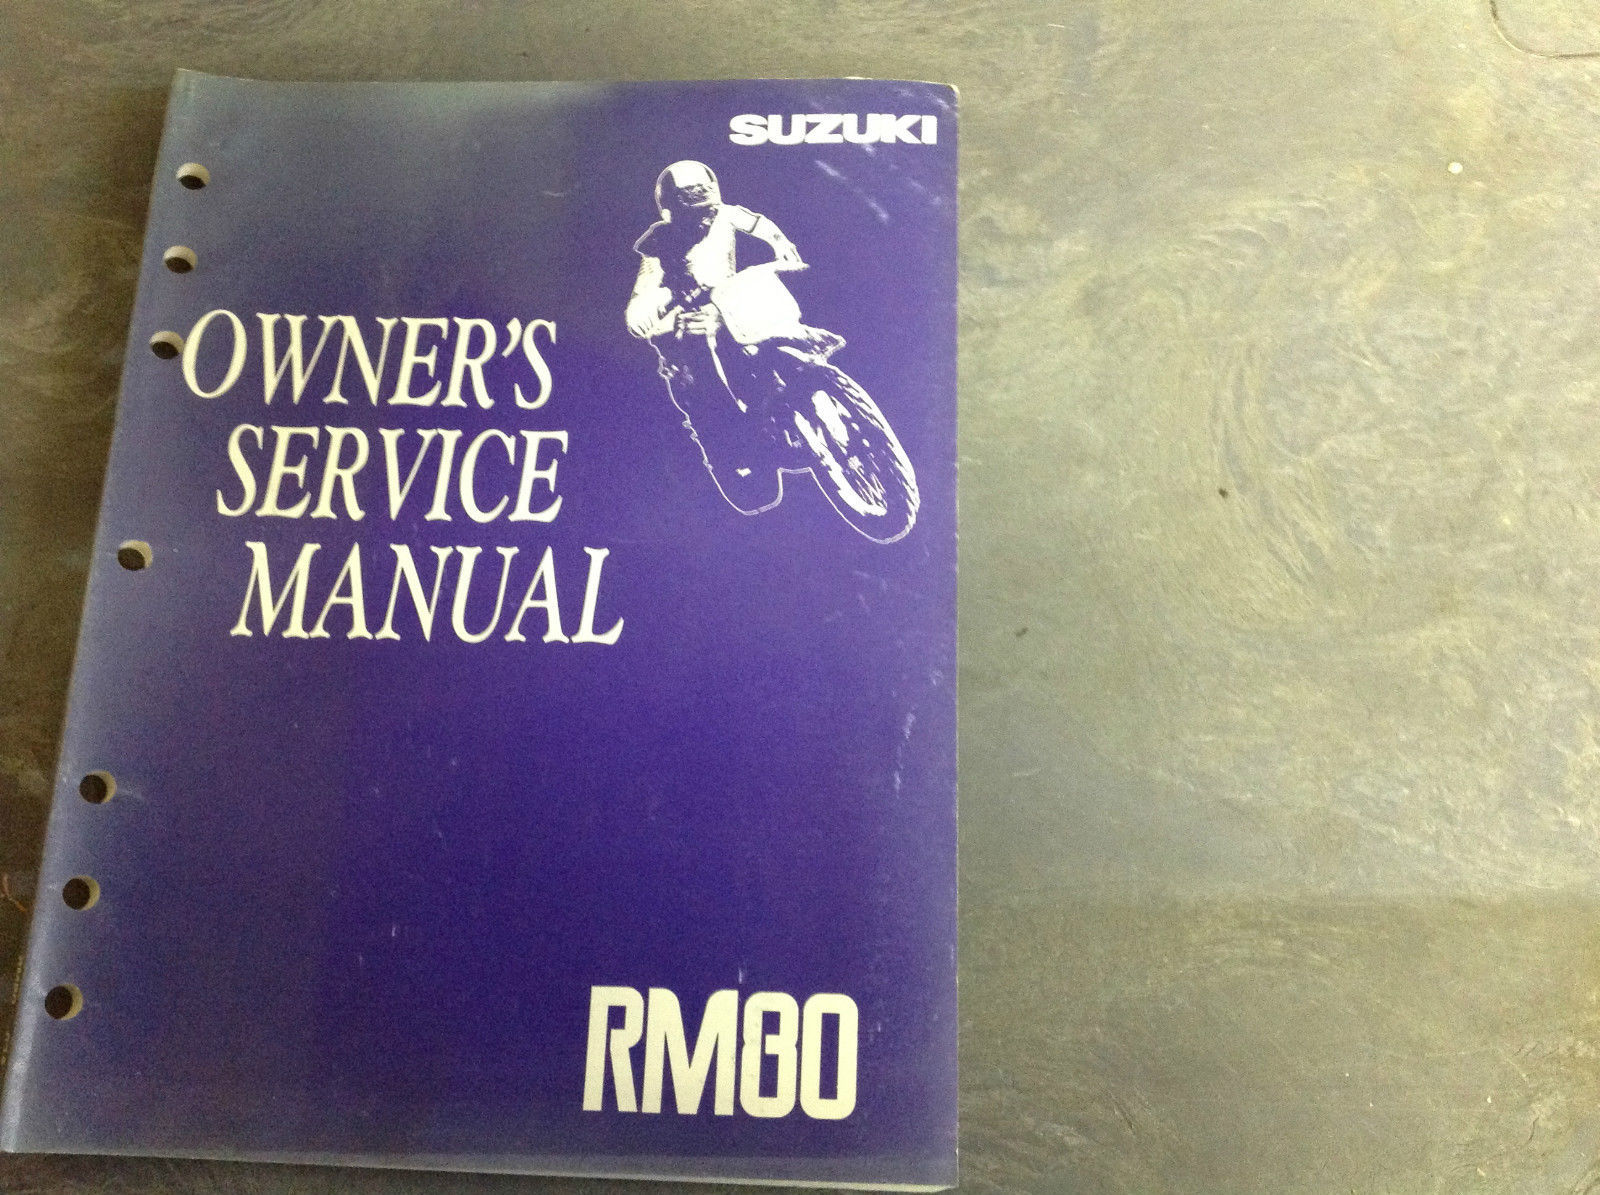 GENUINE SUZUKI OWNERS SERVICE MANUAL RM80 RM 80 1997